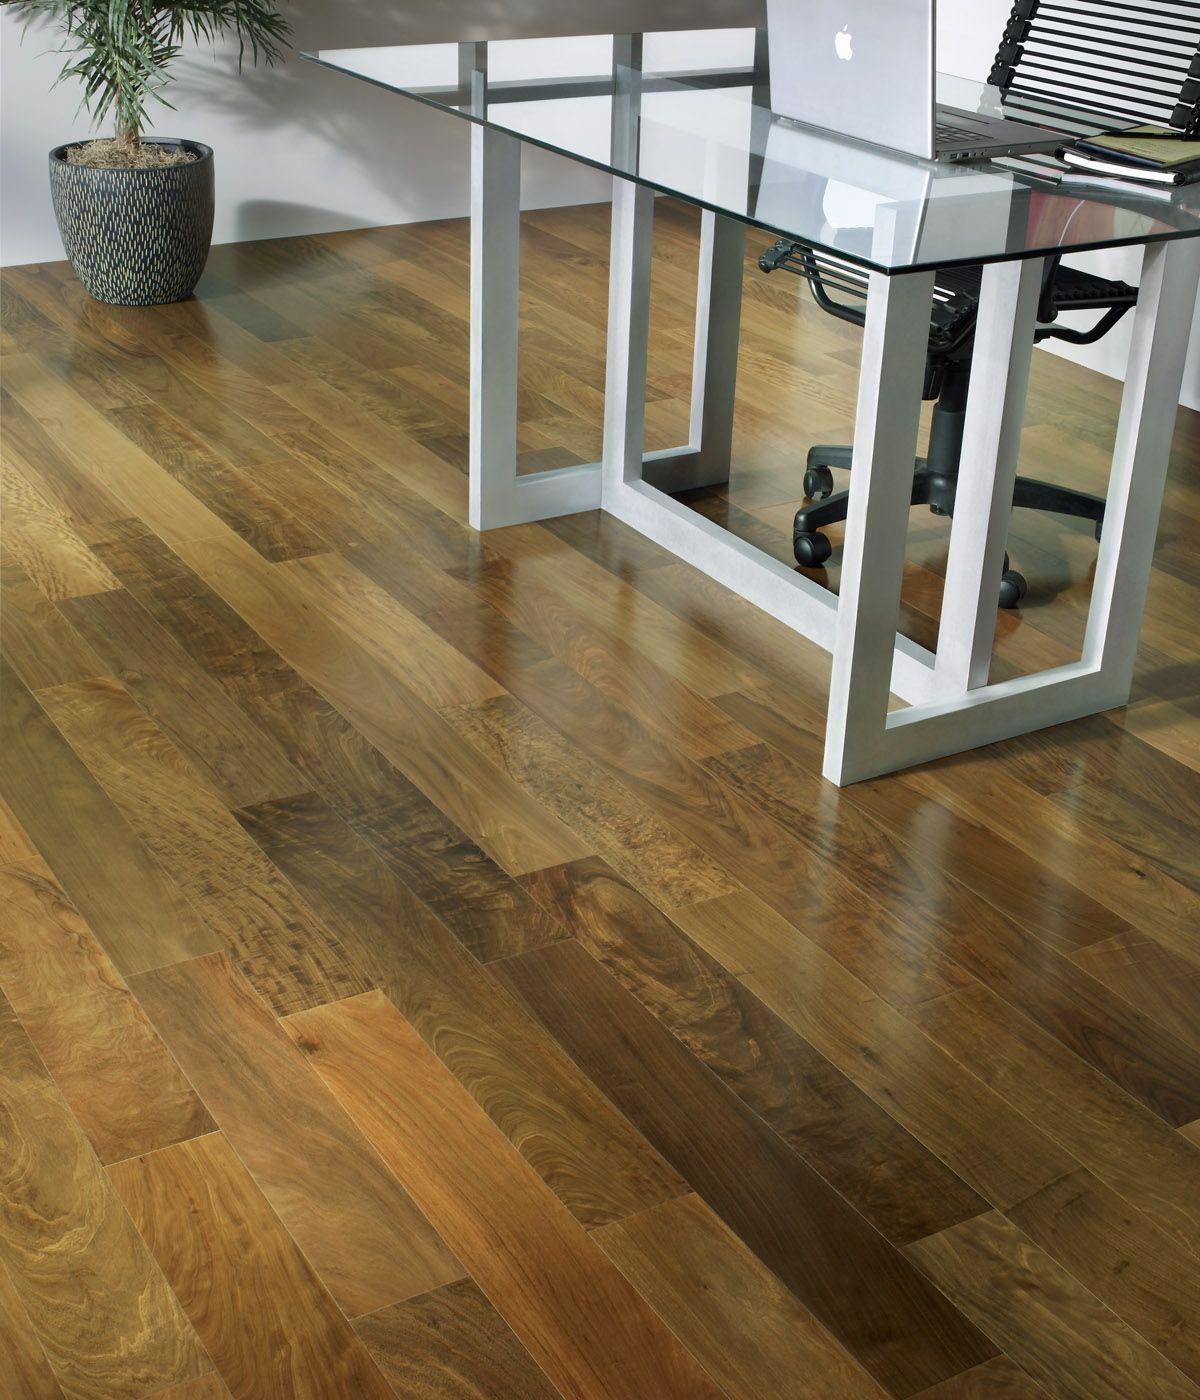 Brazilian ebony hardwood flooring - Brazilian Walnut Hardwood Flooring Close Up In The Home Office